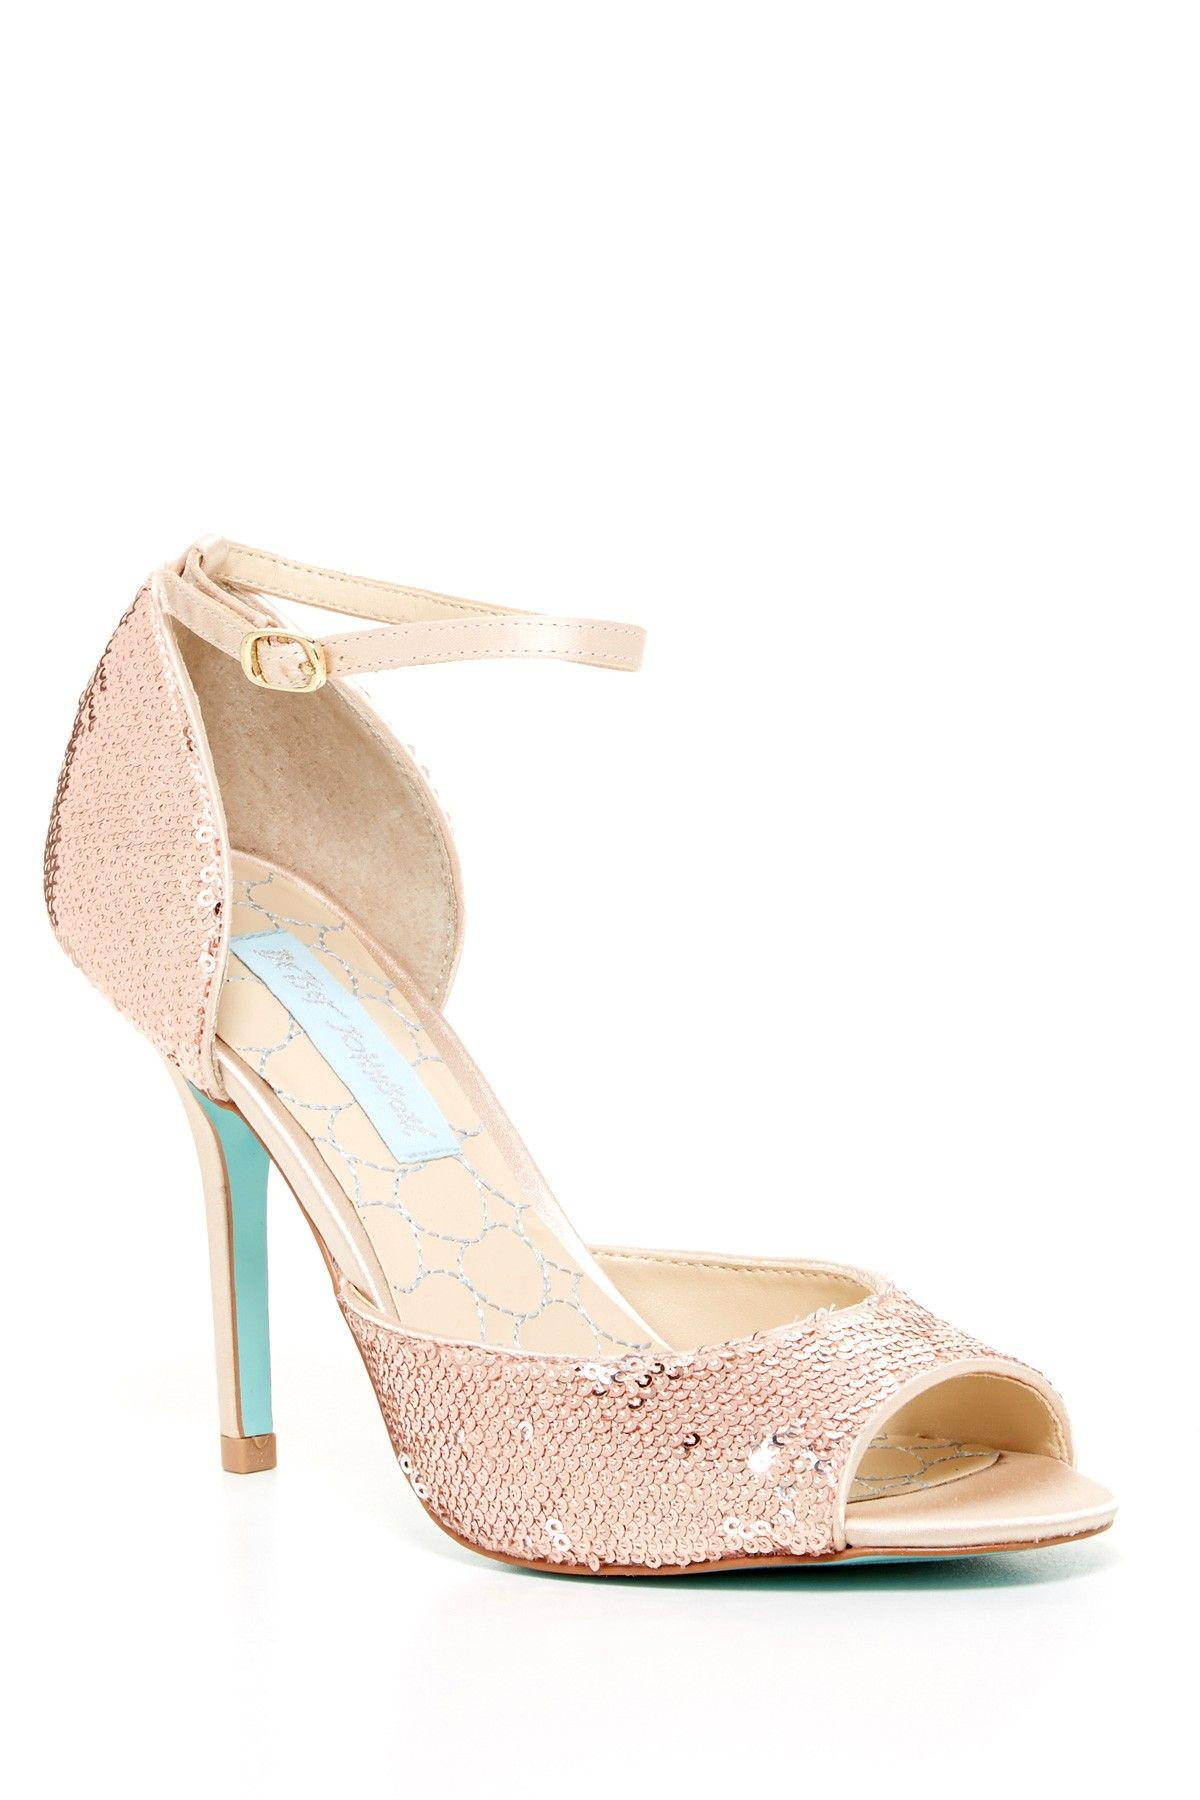 Betsey Johnson Wed High Heel Sandal Wedding high heels